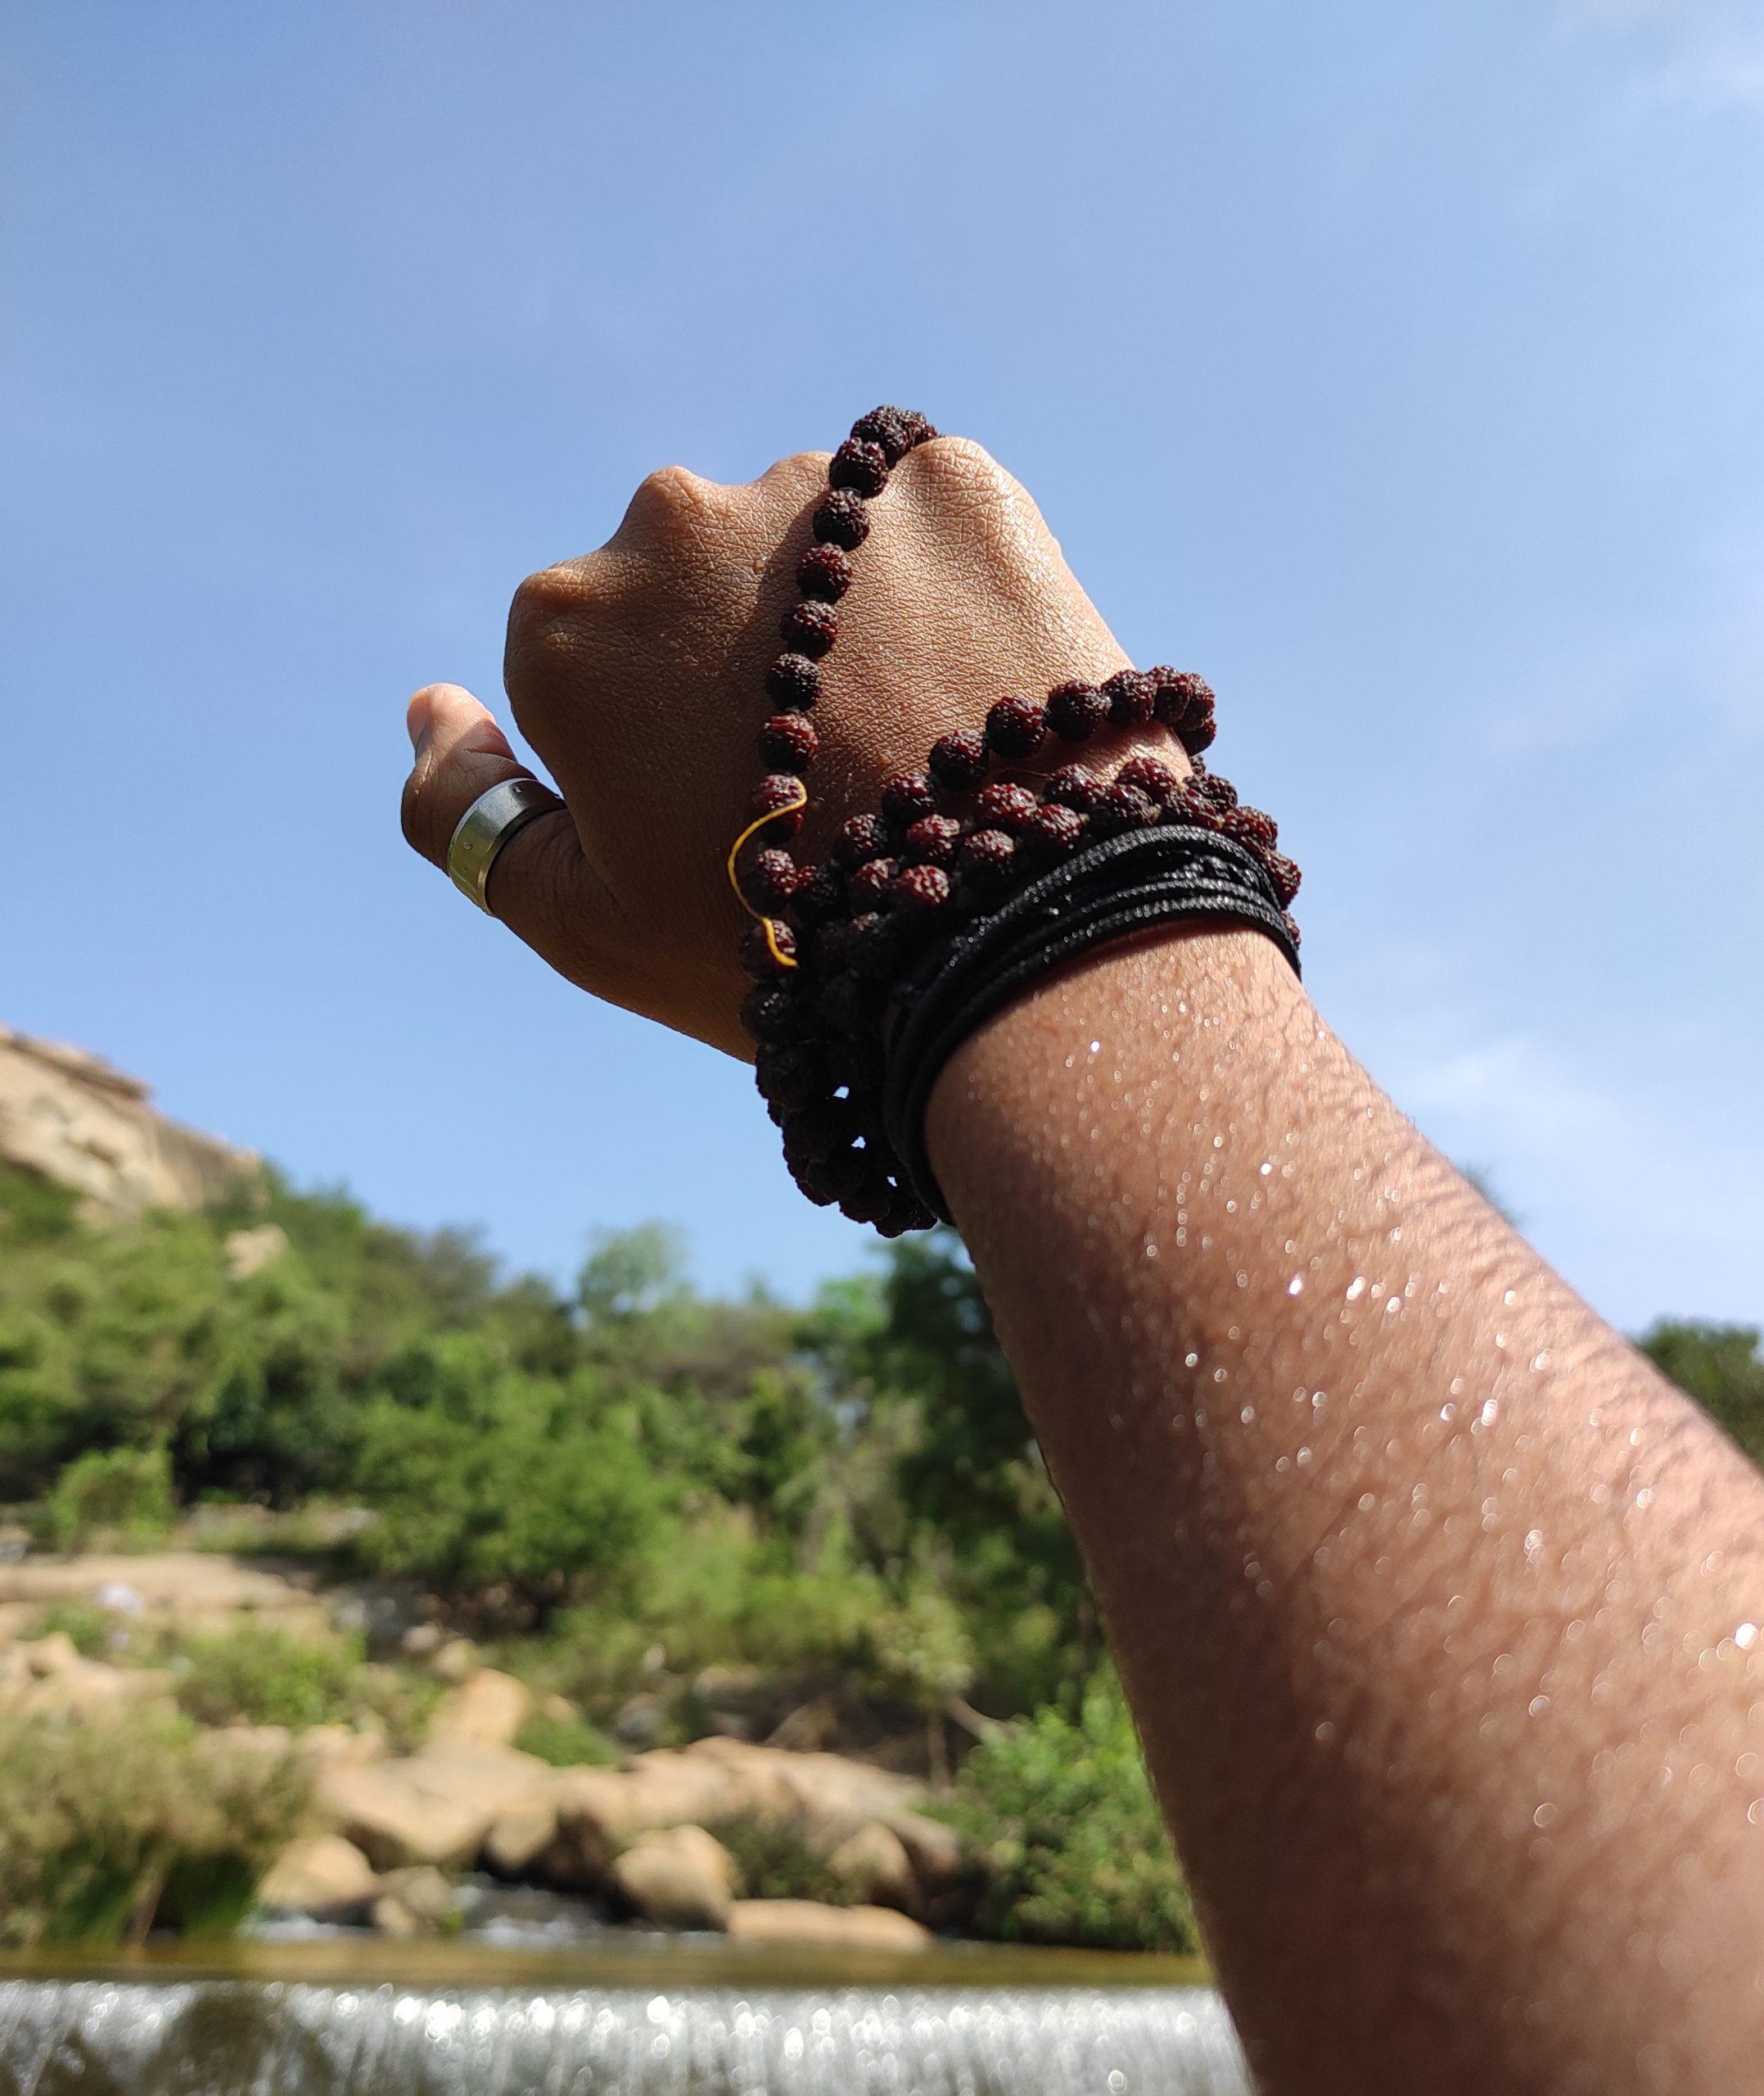 Rudrakash in hand